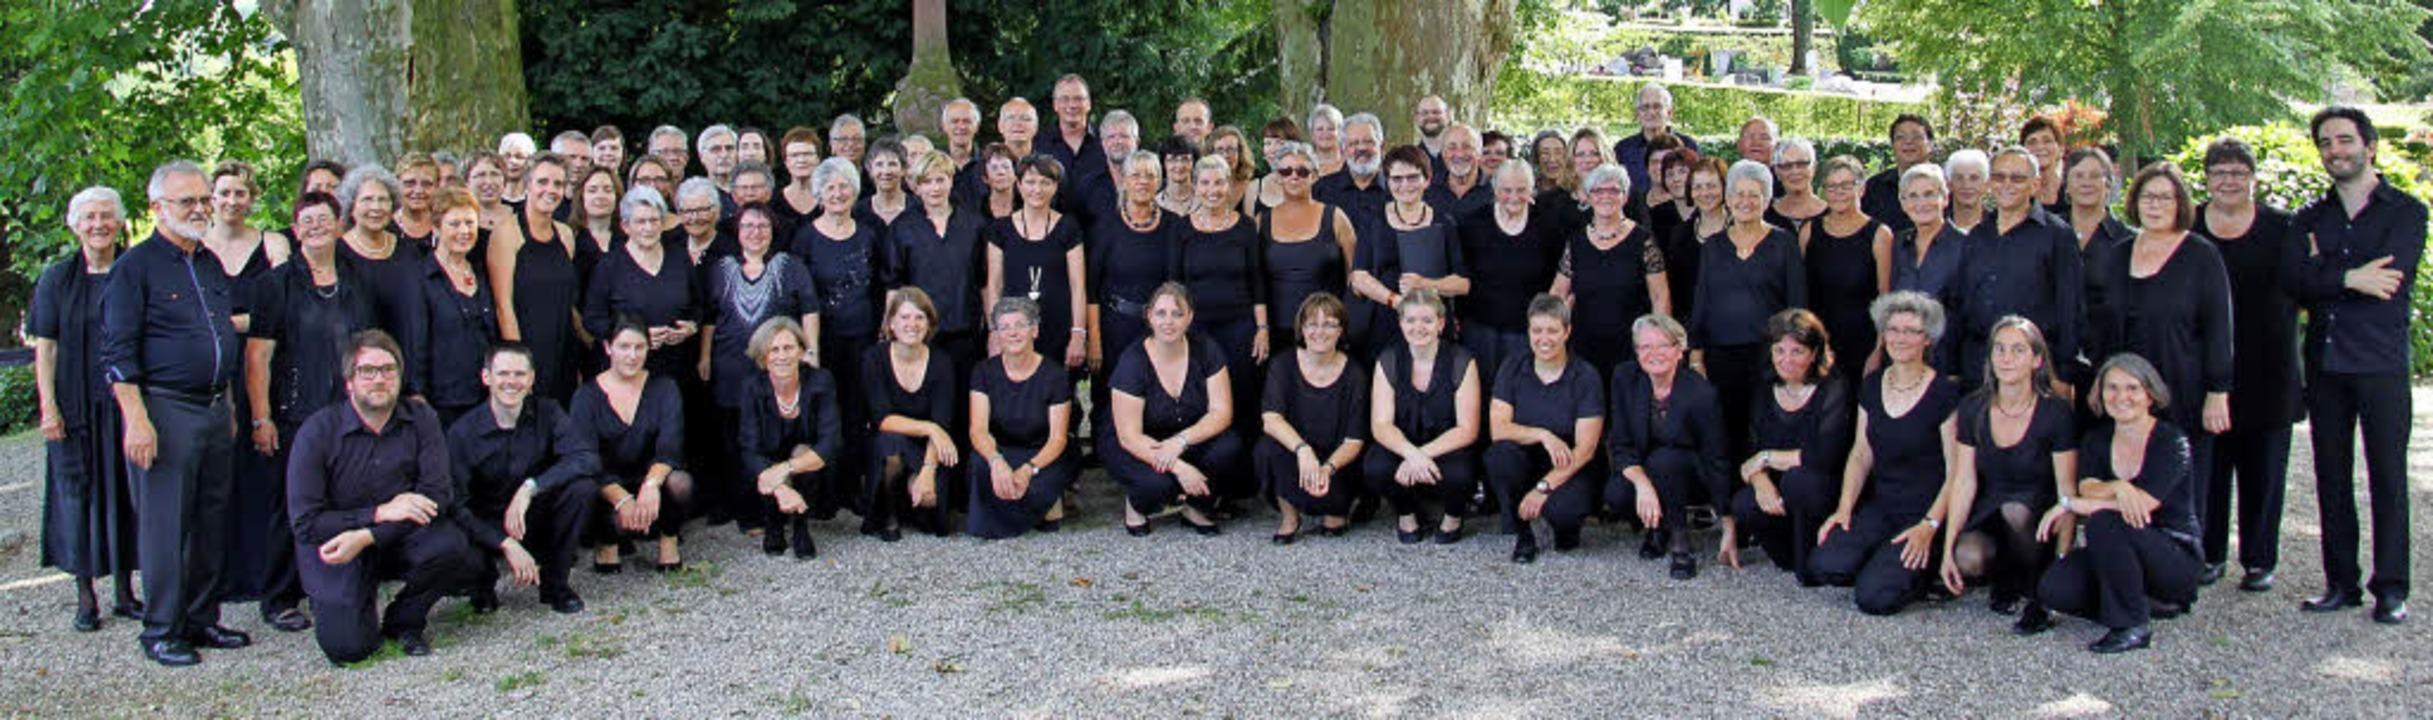 | Foto: Kirchenchor Münchweier